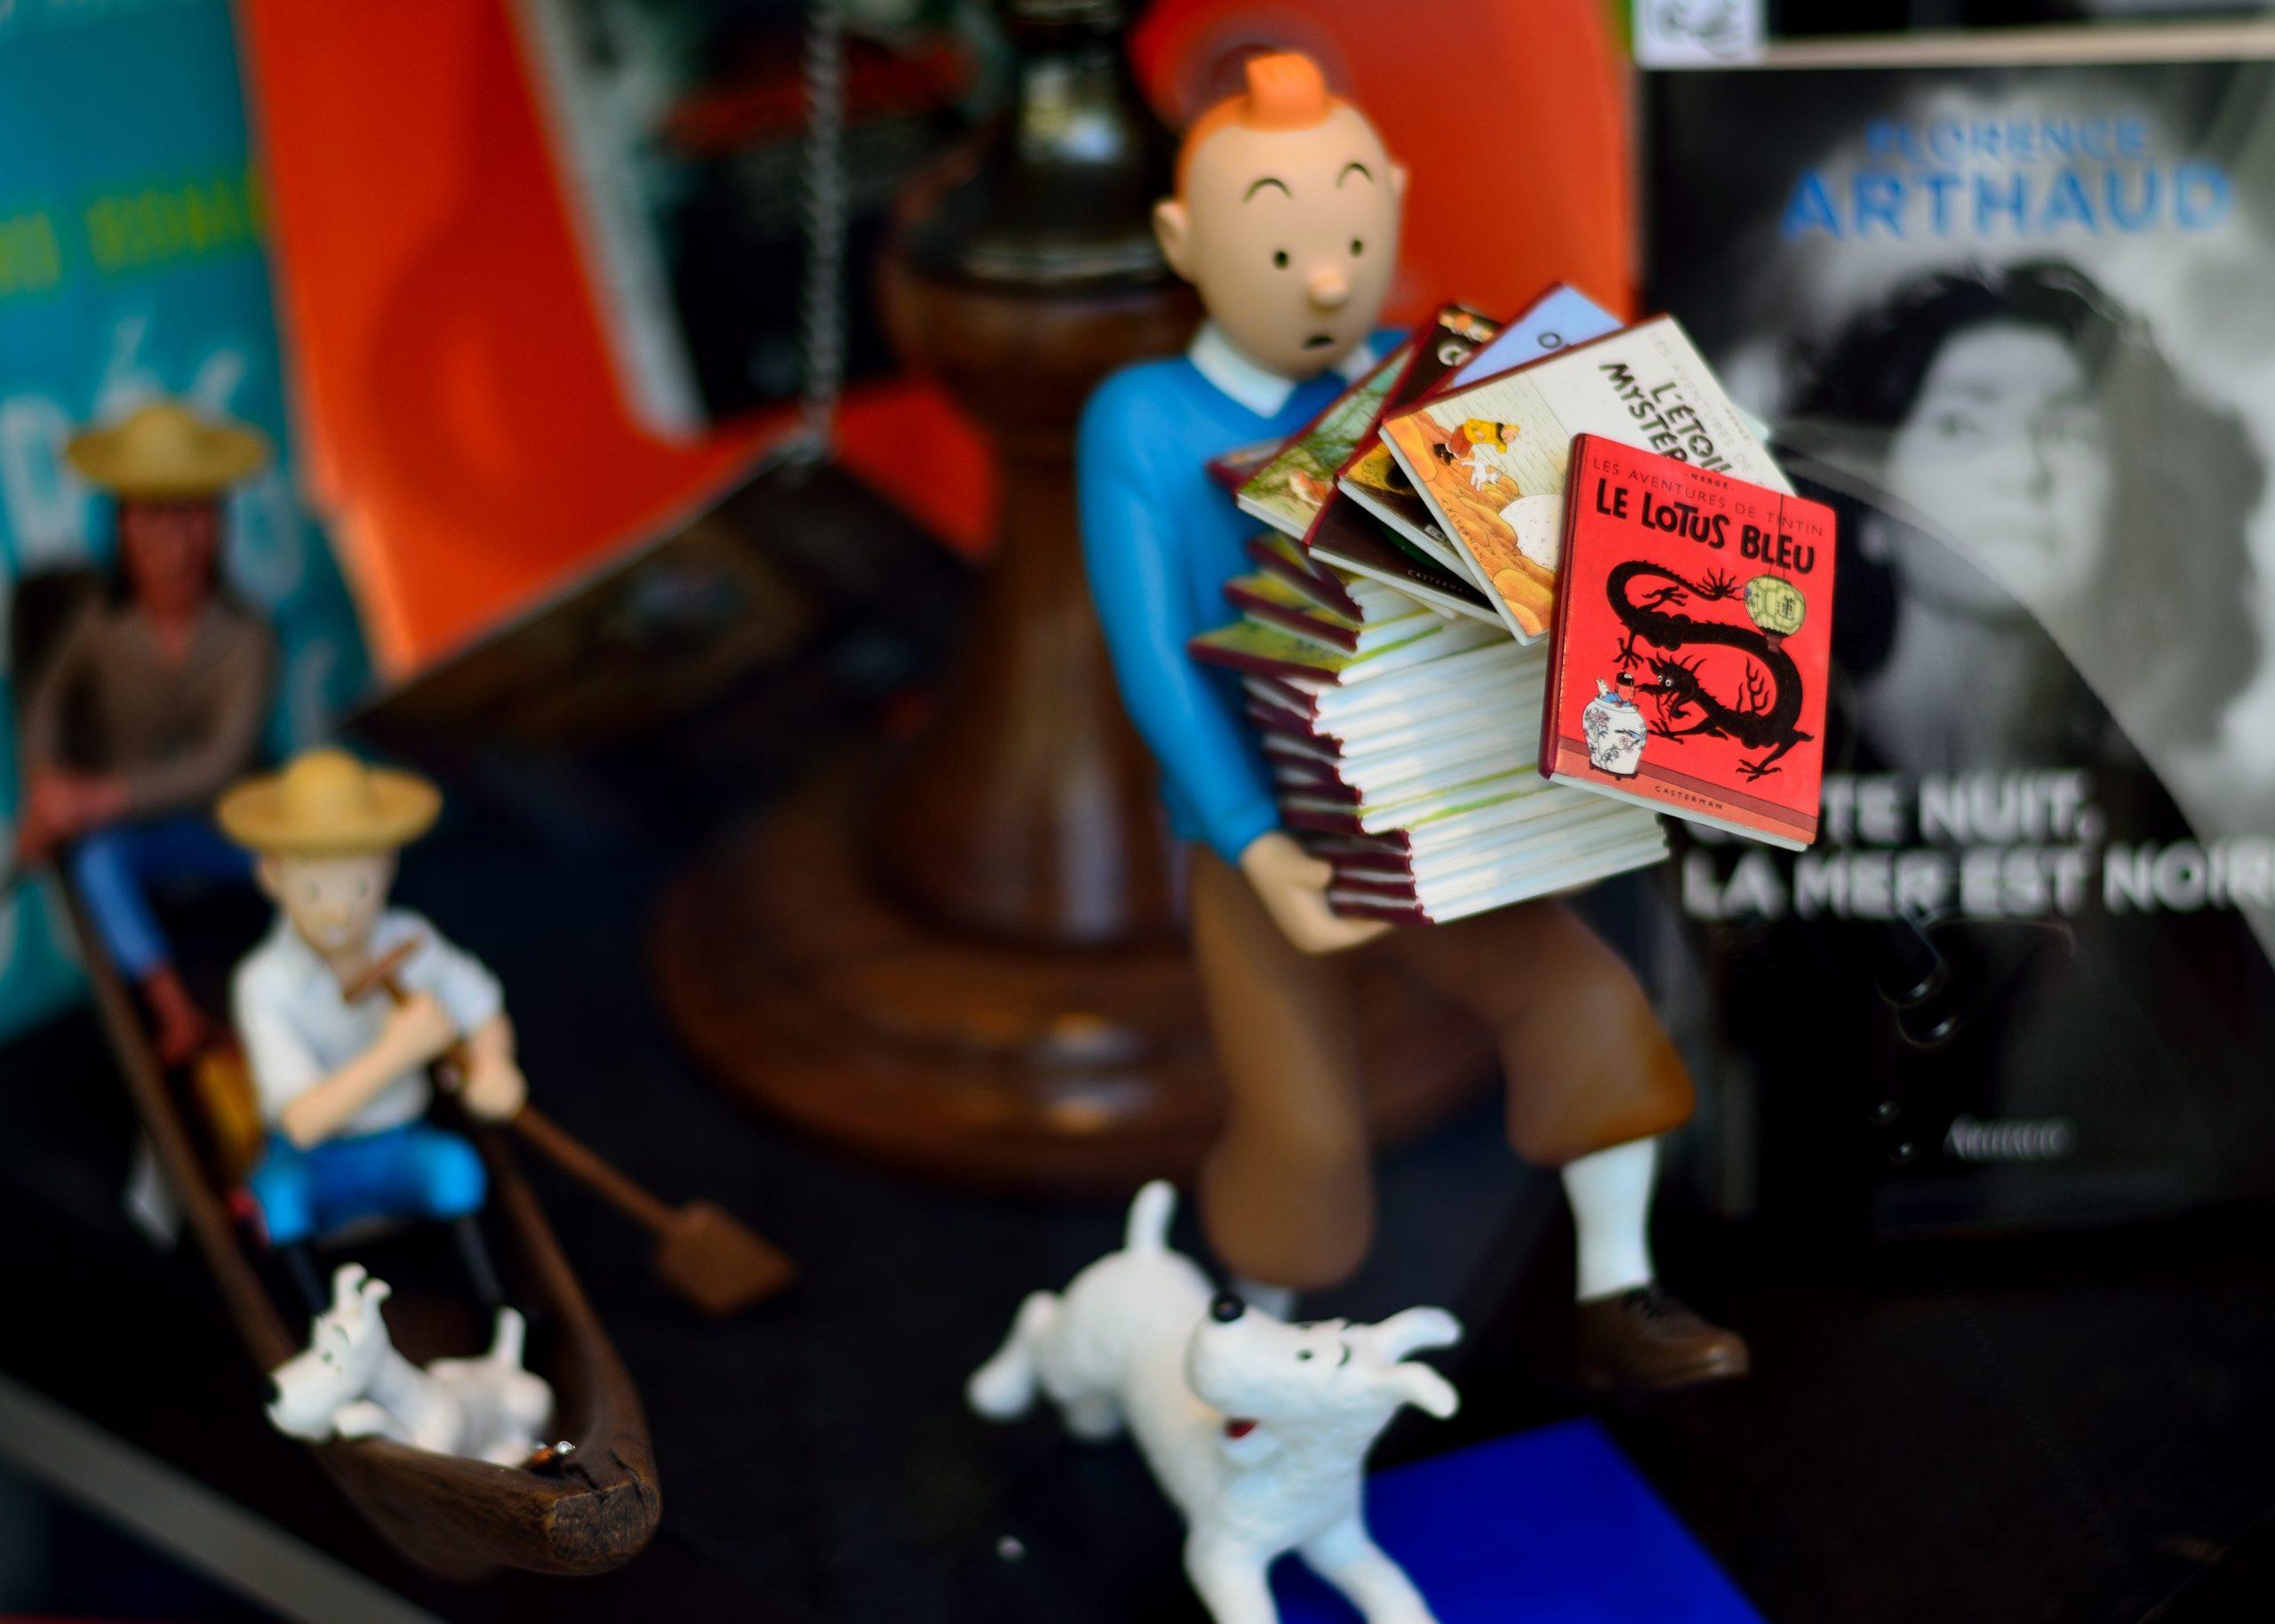 Embark on Tintin spaceship to the Moon